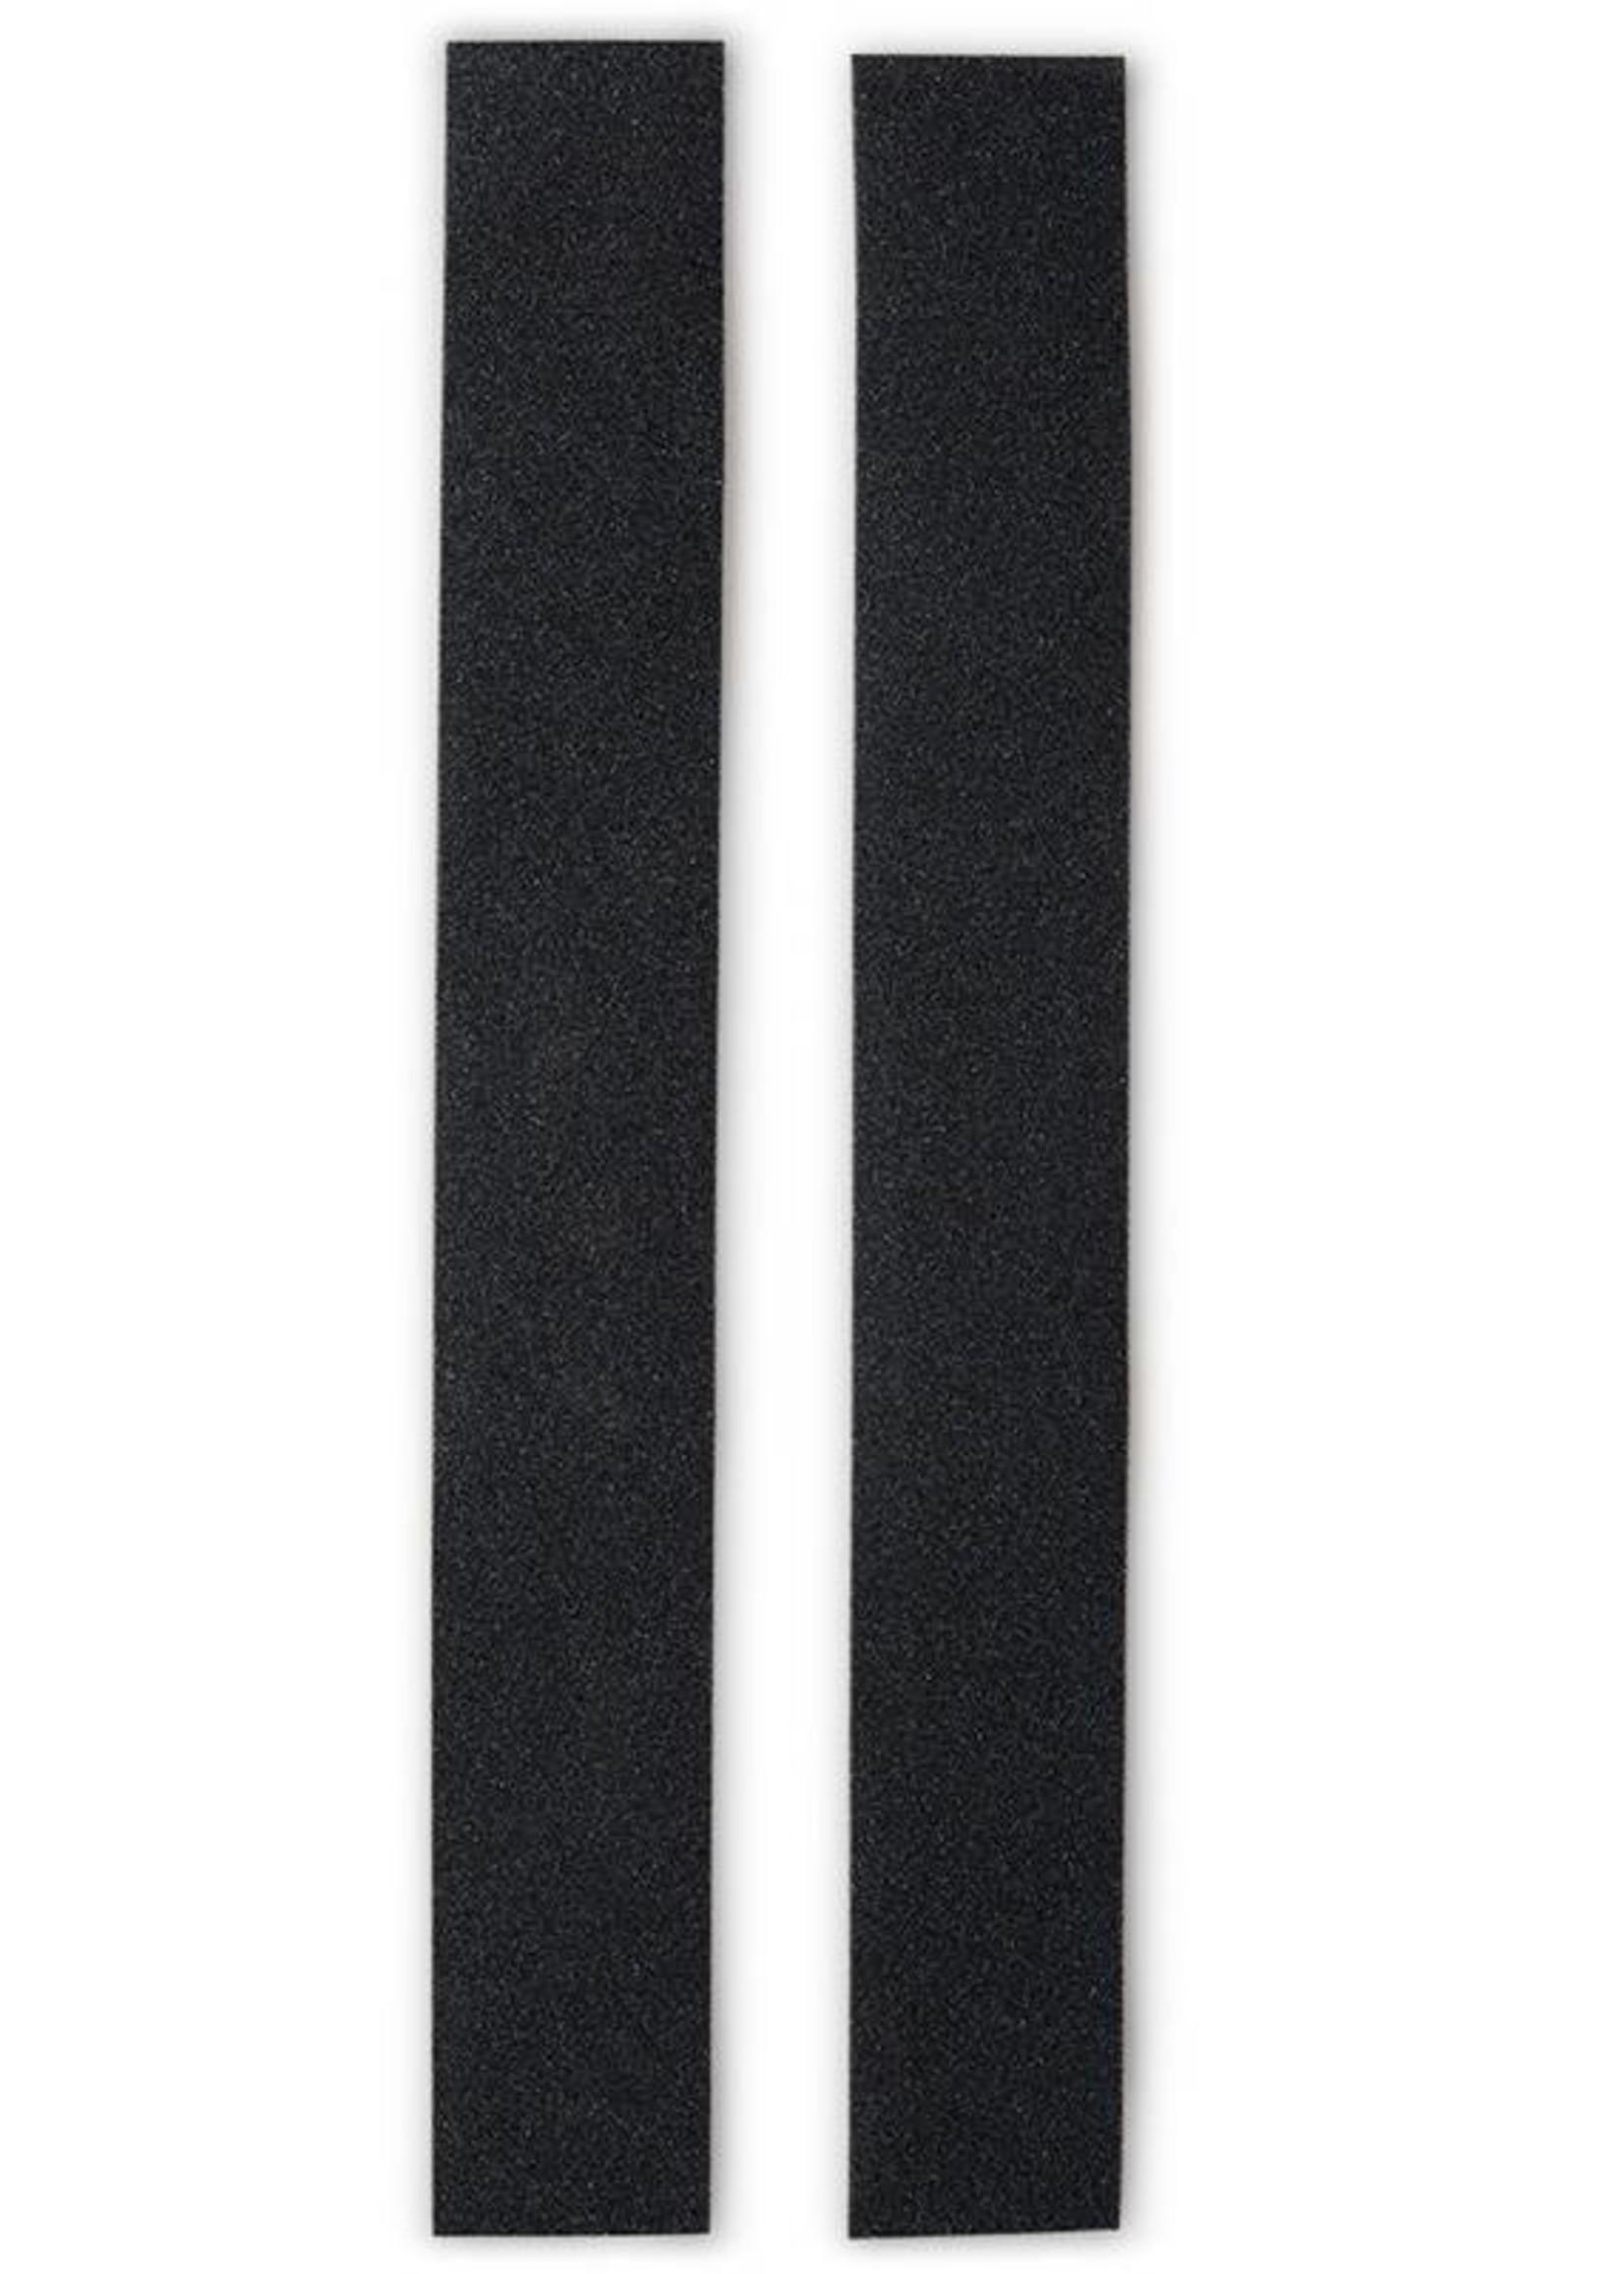 Vew-Do Vew-Do Replacement Griptape Haftbelag für Balancetrainer